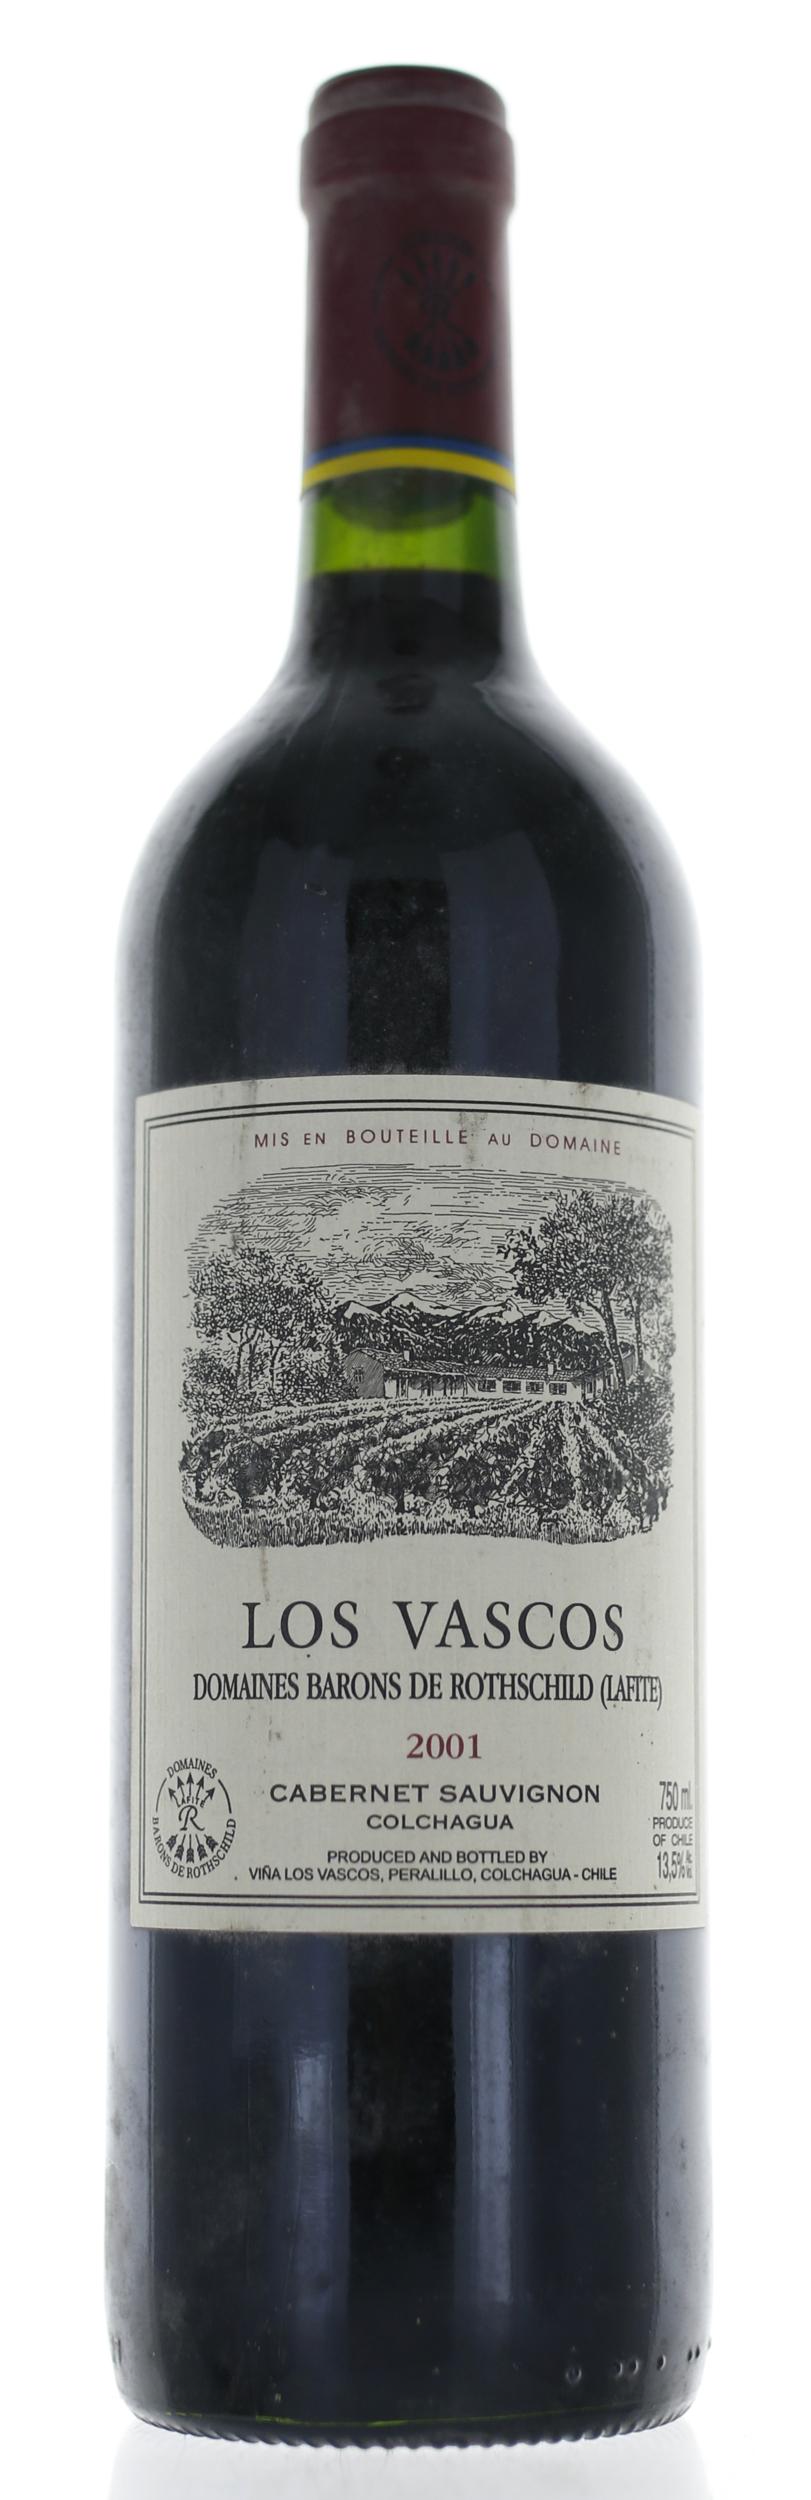 Los Vascos - Domaine de Rothschild -  2001